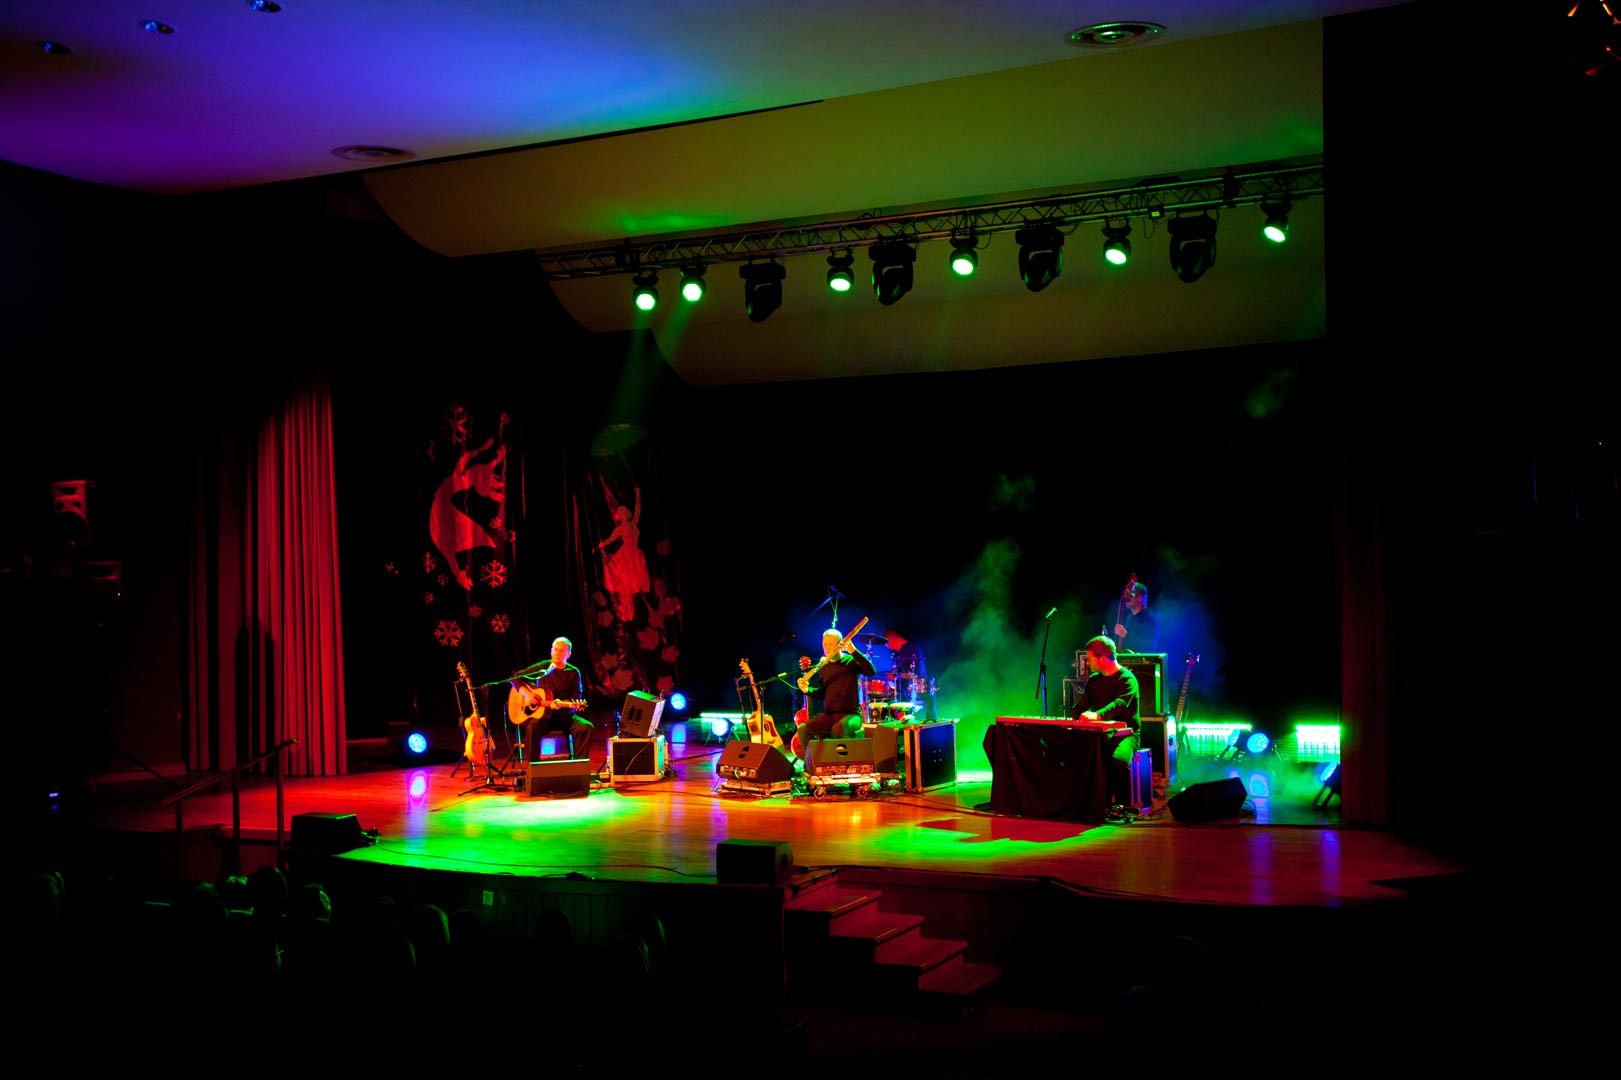 048-event_concert